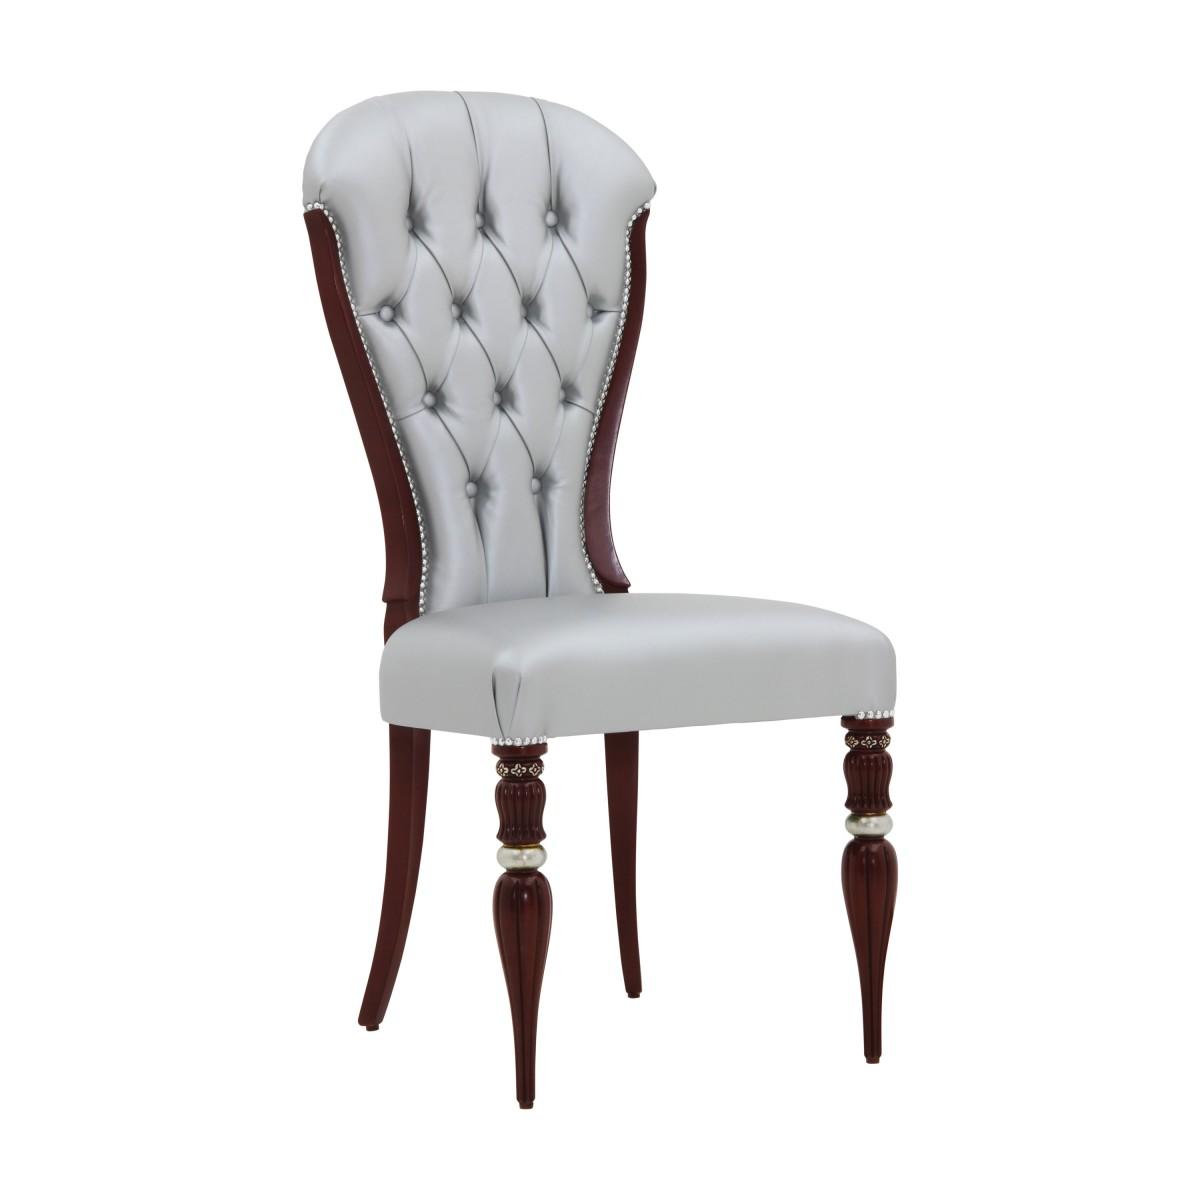 replica chair adele 6348